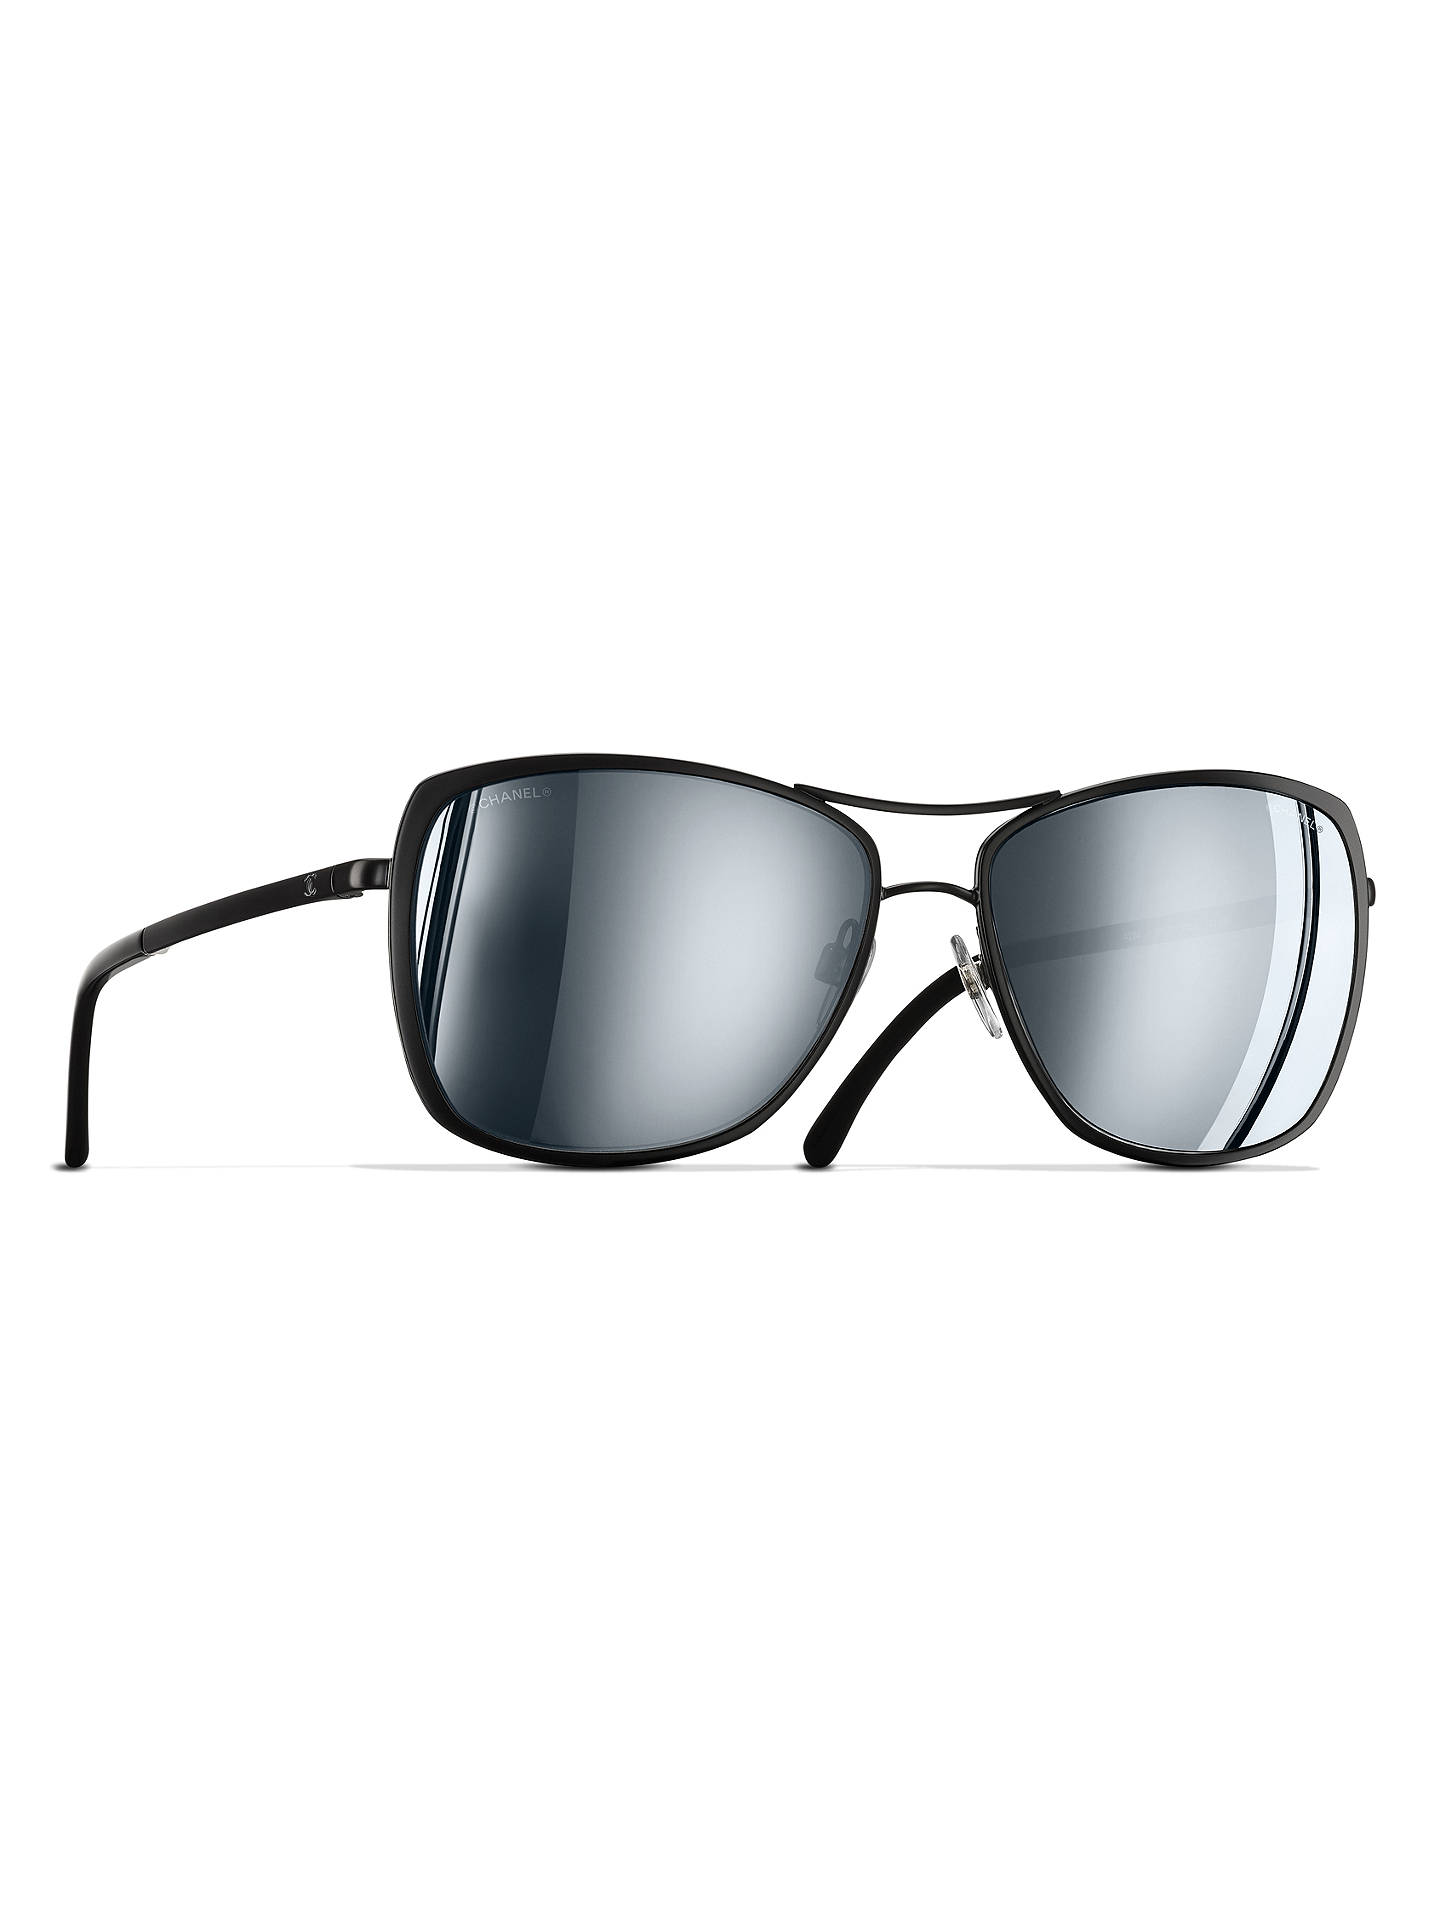 153f08c9ed BuyCHANEL Pilot Sunglasses CH4224 Black Online at johnlewis.com ...